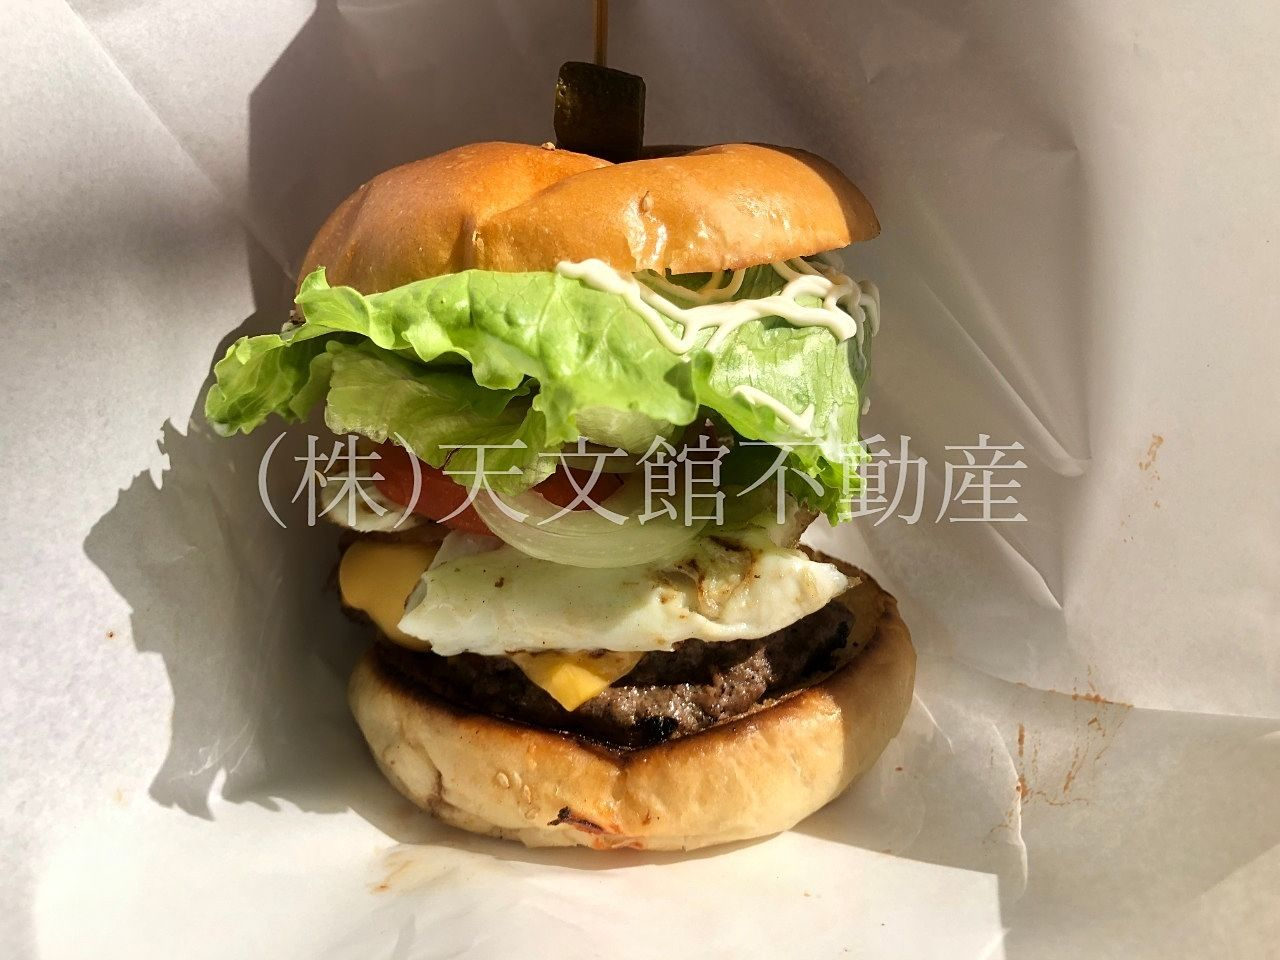 KAZBO Burger(カズボバーガー)ボリューム満点 バーガー